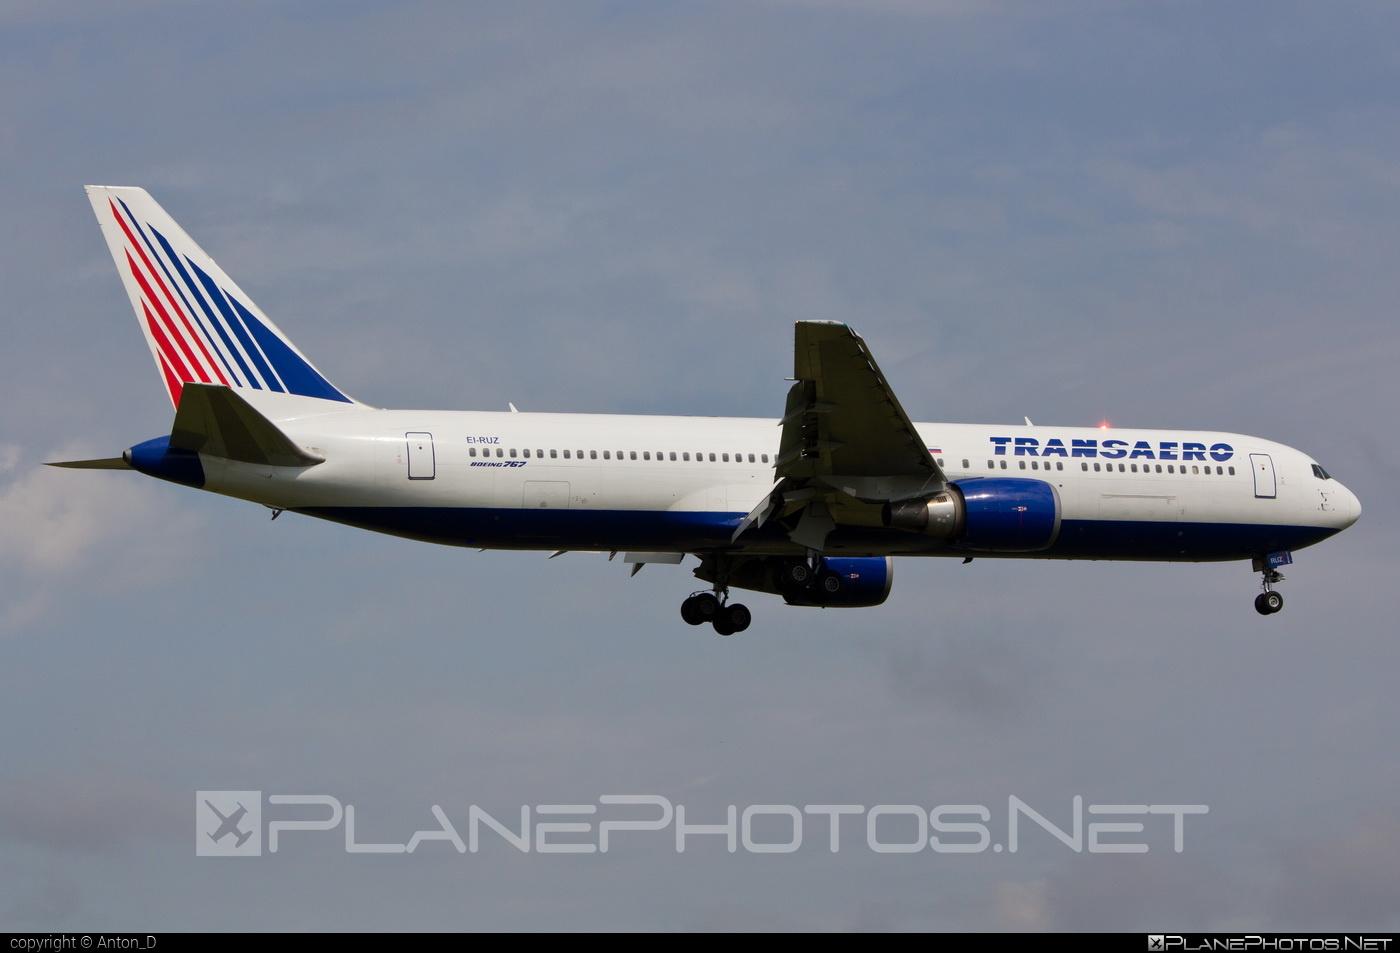 Boeing 767-300ER - EI-RUZ operated by Transaero Airlines #b767 #b767er #boeing #boeing767